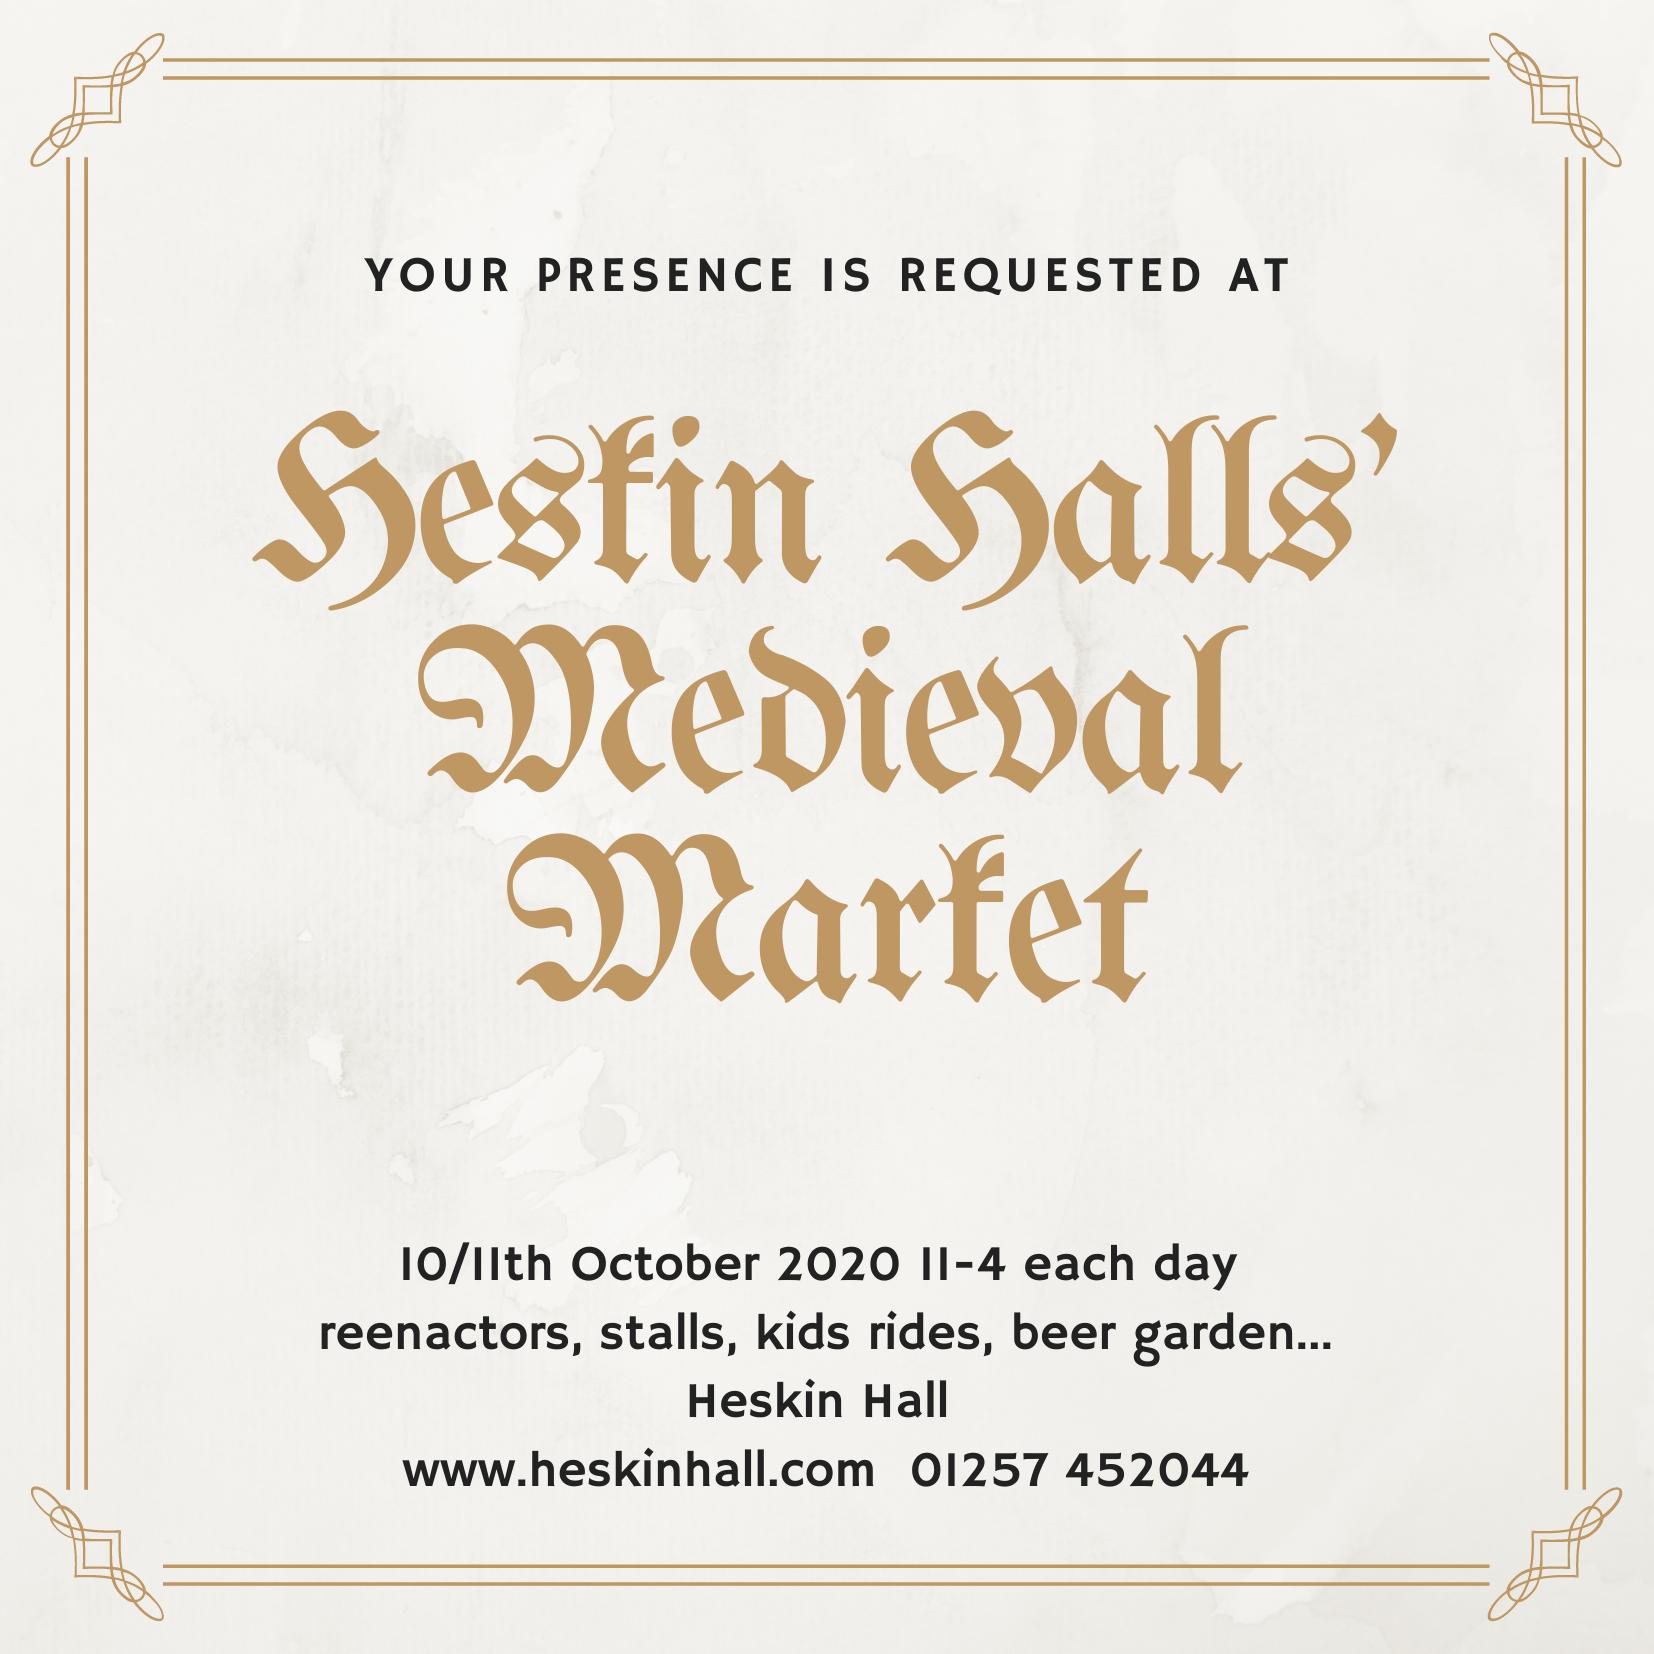 Medieval market Heskin Hall